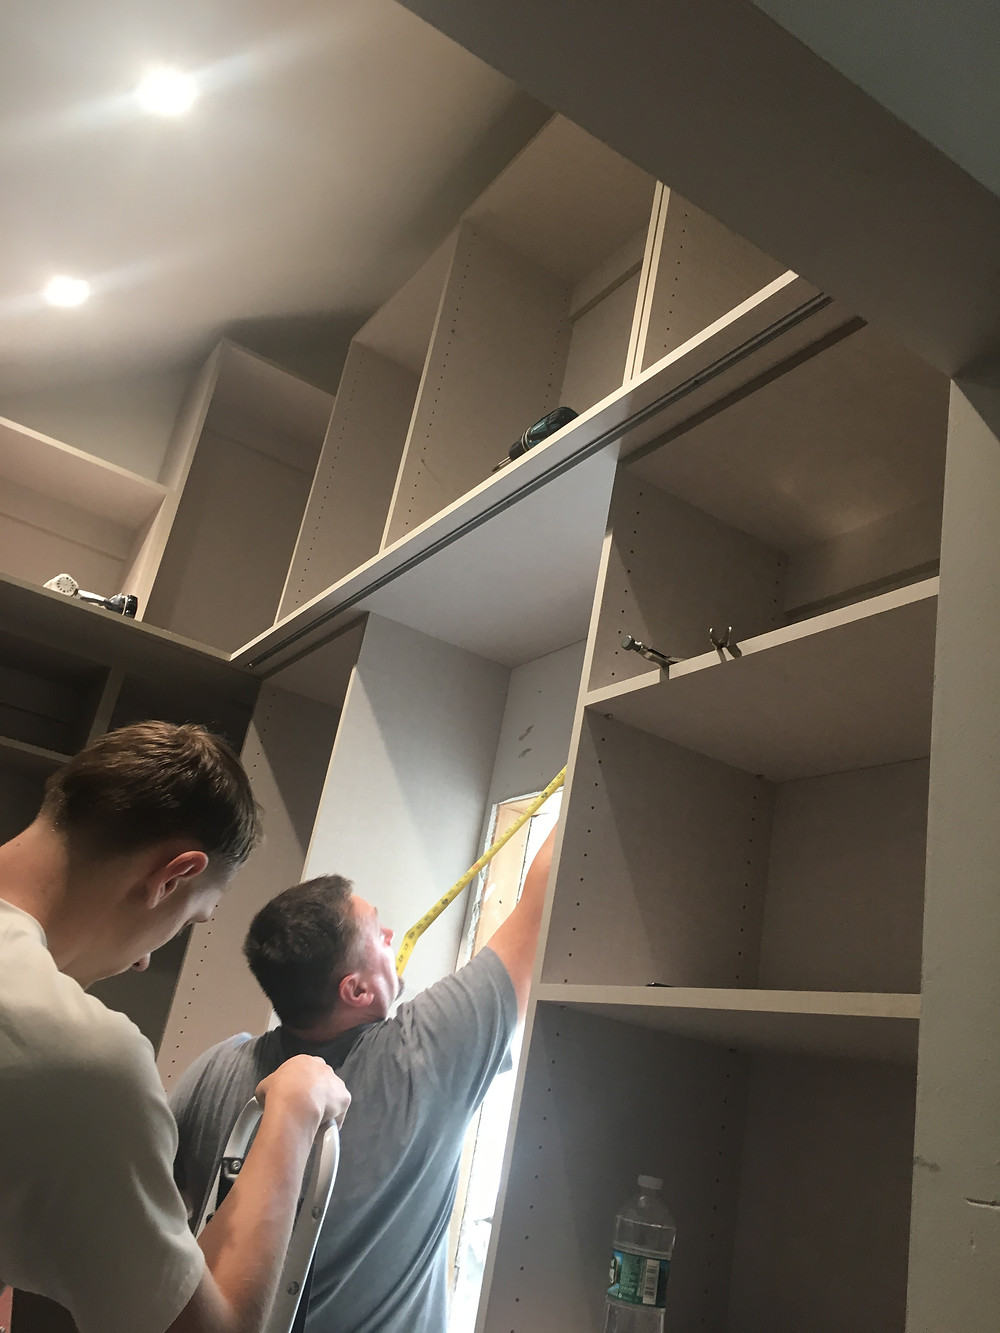 Closet installers hard at work.